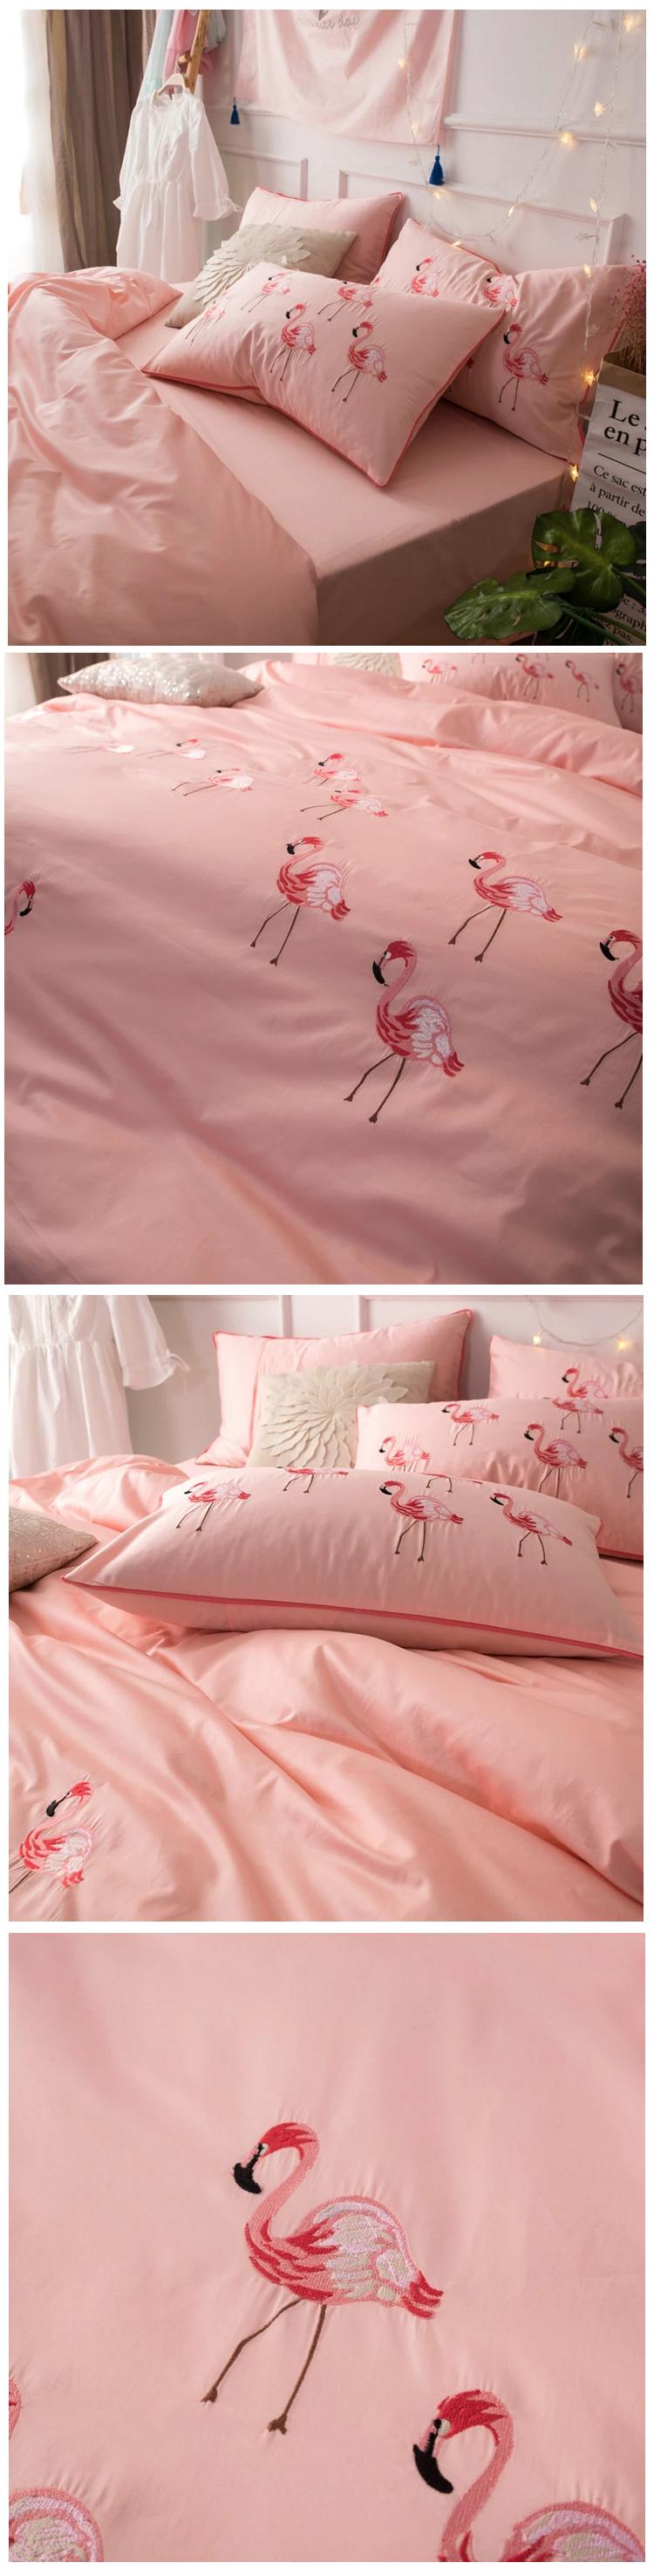 Flamingo Flamingo1 Flamingo2 Flamingo3